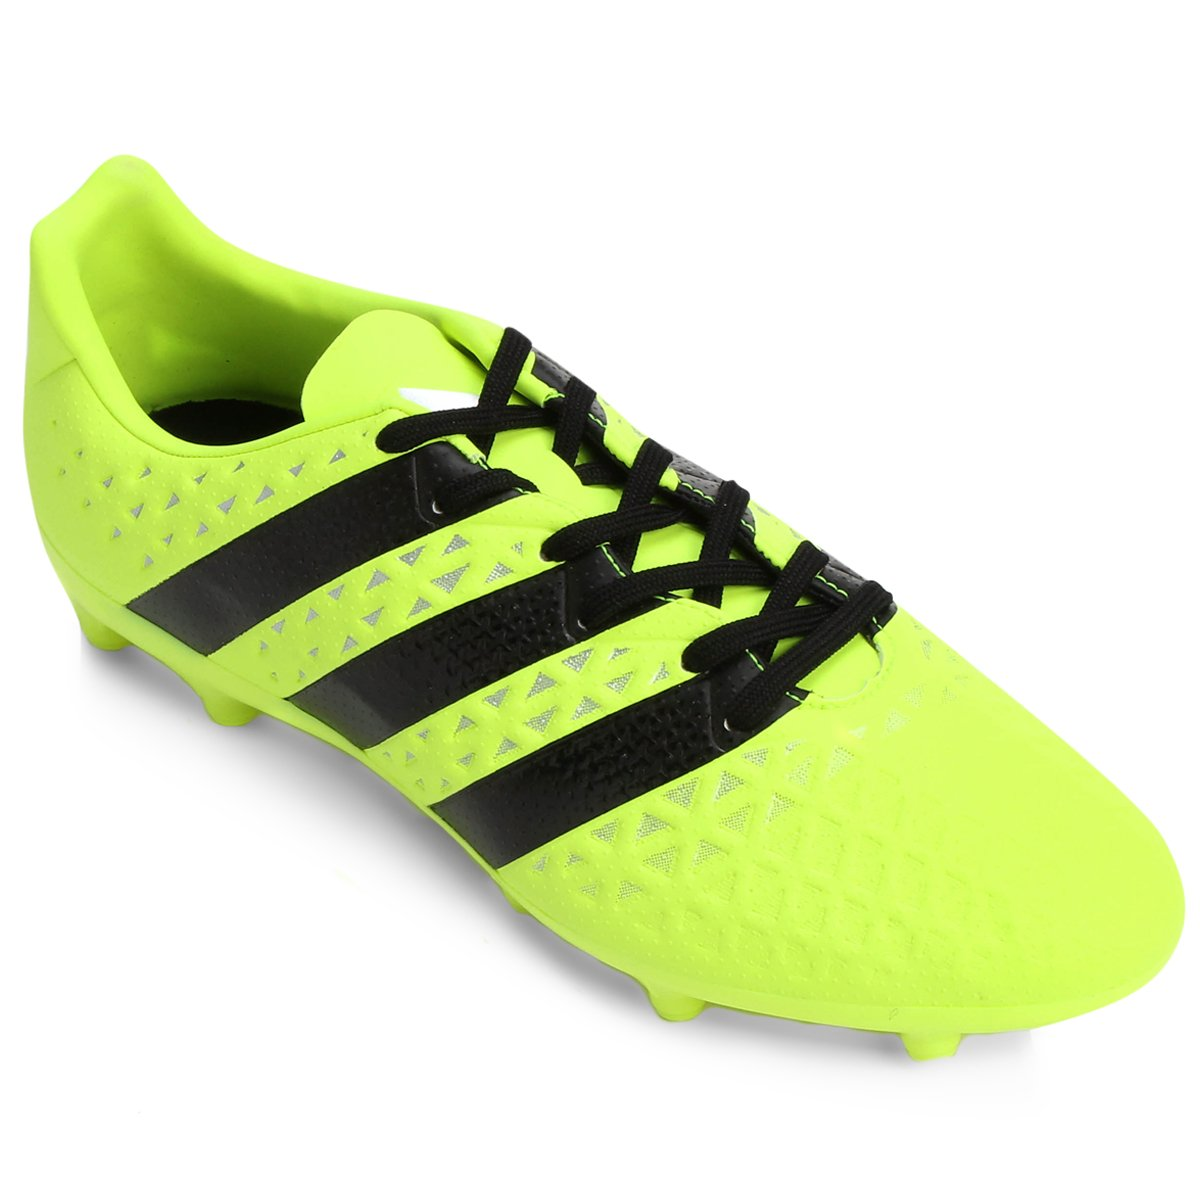 Chuteira Campo Adidas Ace 16.3 FG Masculina - Compre Agora  2ddc6fb033225